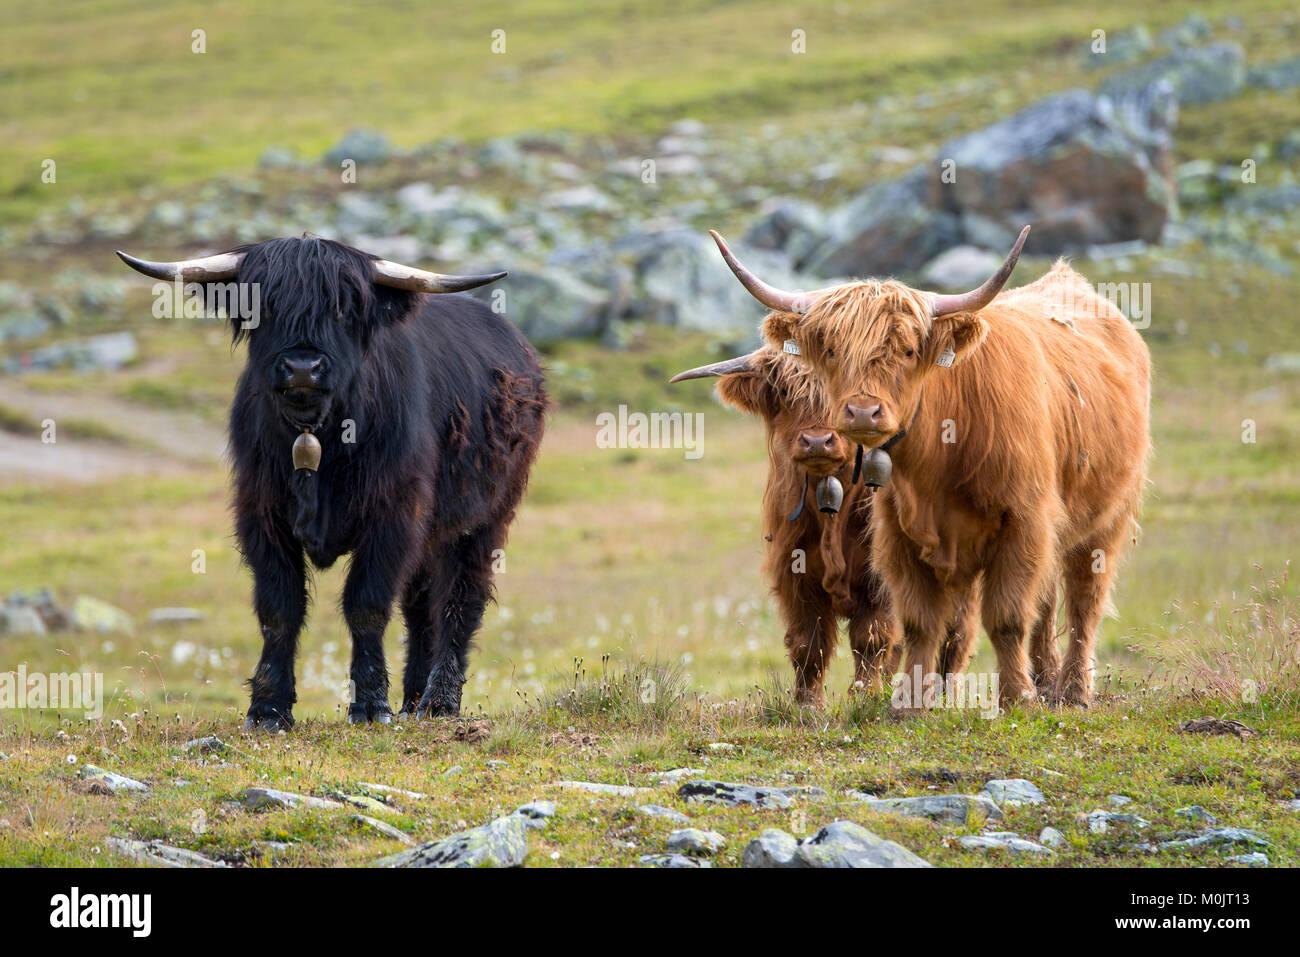 Highland scozzesi bestiame sul pascolo alpino, Scheidseen, Galtür, Tirolo, Austria Immagini Stock